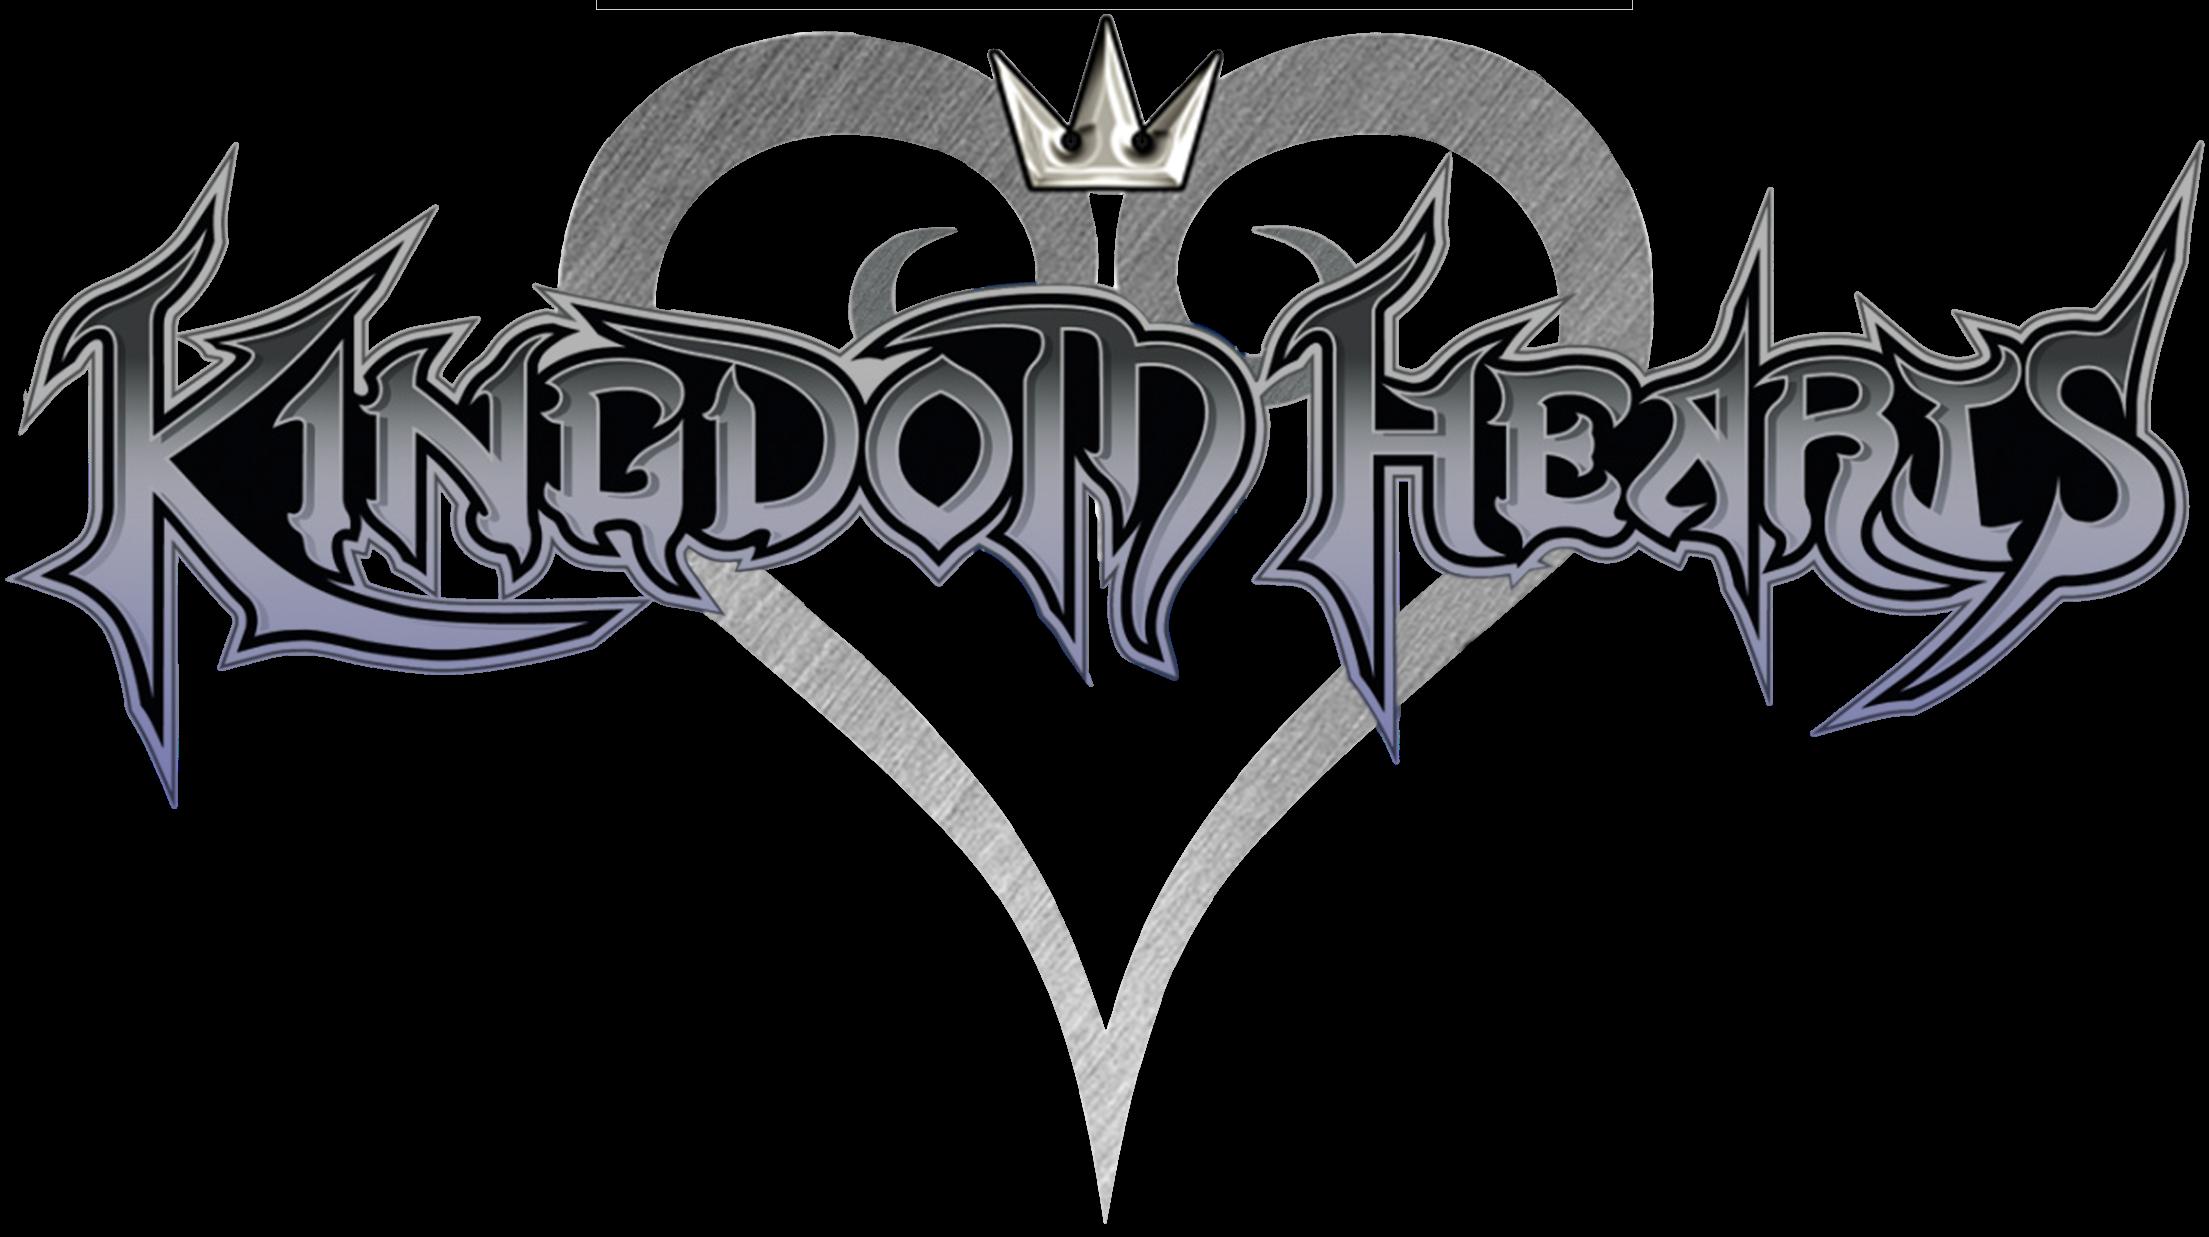 Kingdom Hearts (series).